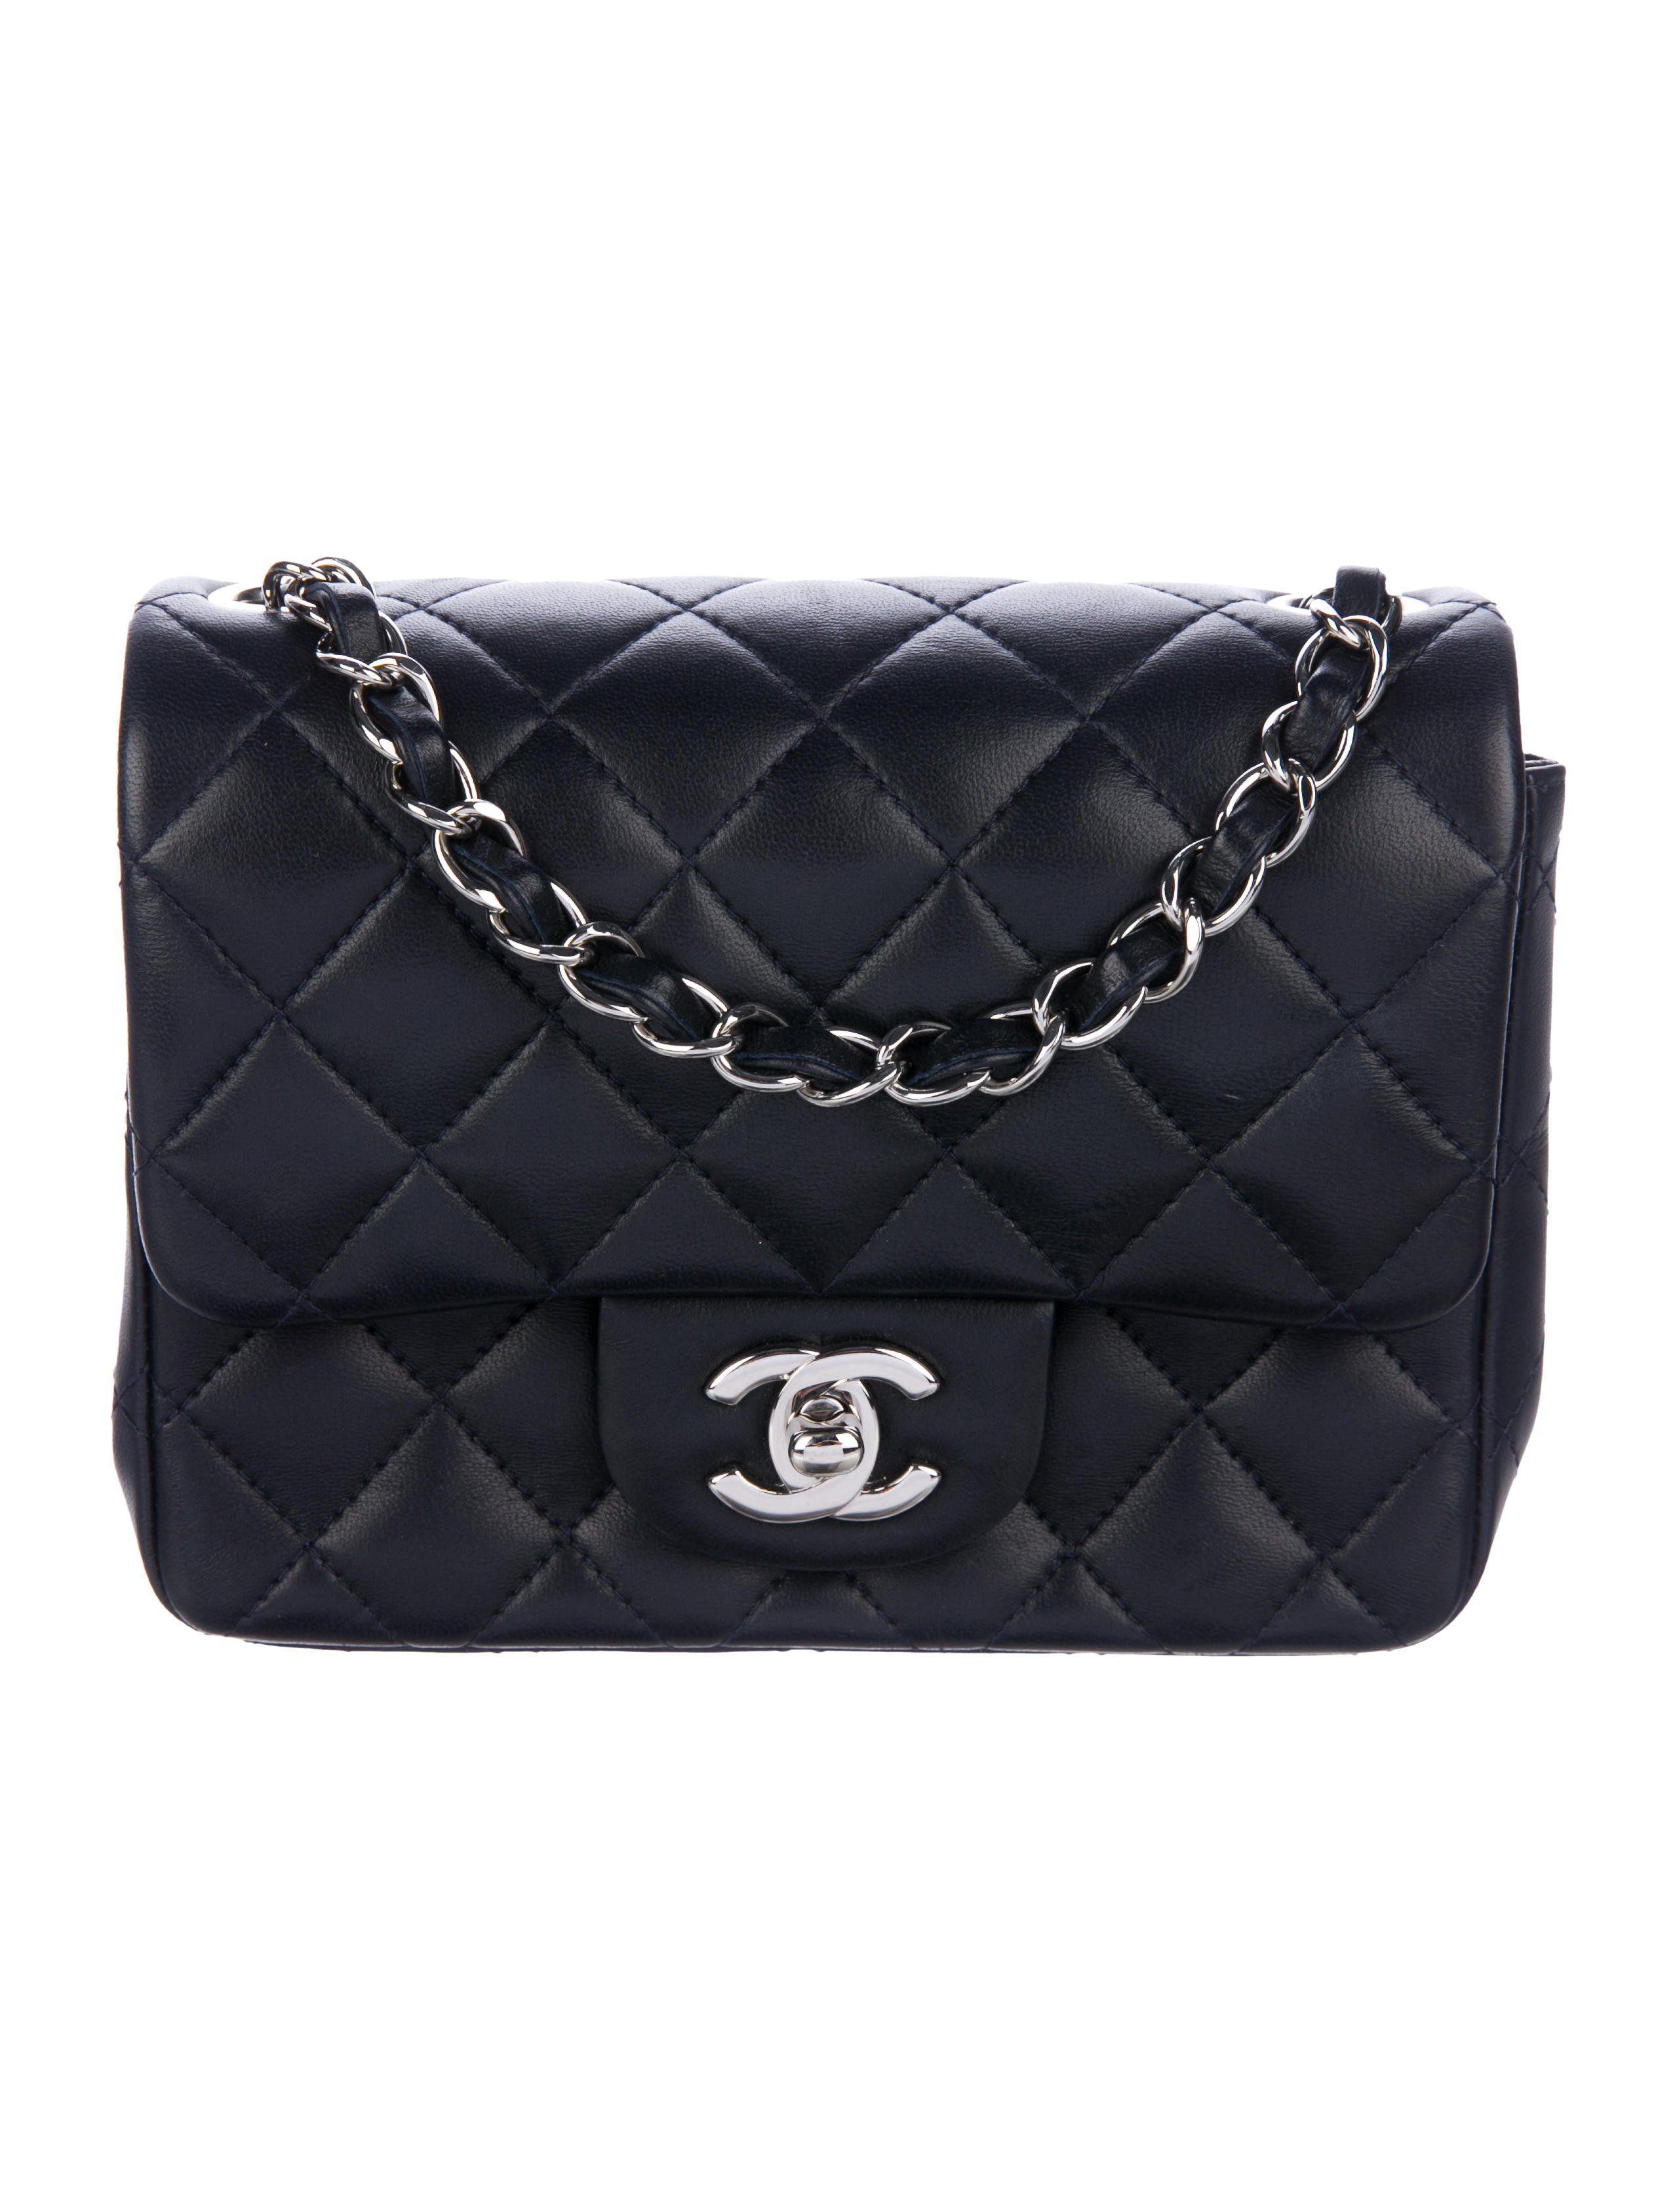 672997ee674853 Chanel Classic Mini Square Flap Bag - Handbags - CHA282551 | The RealReal